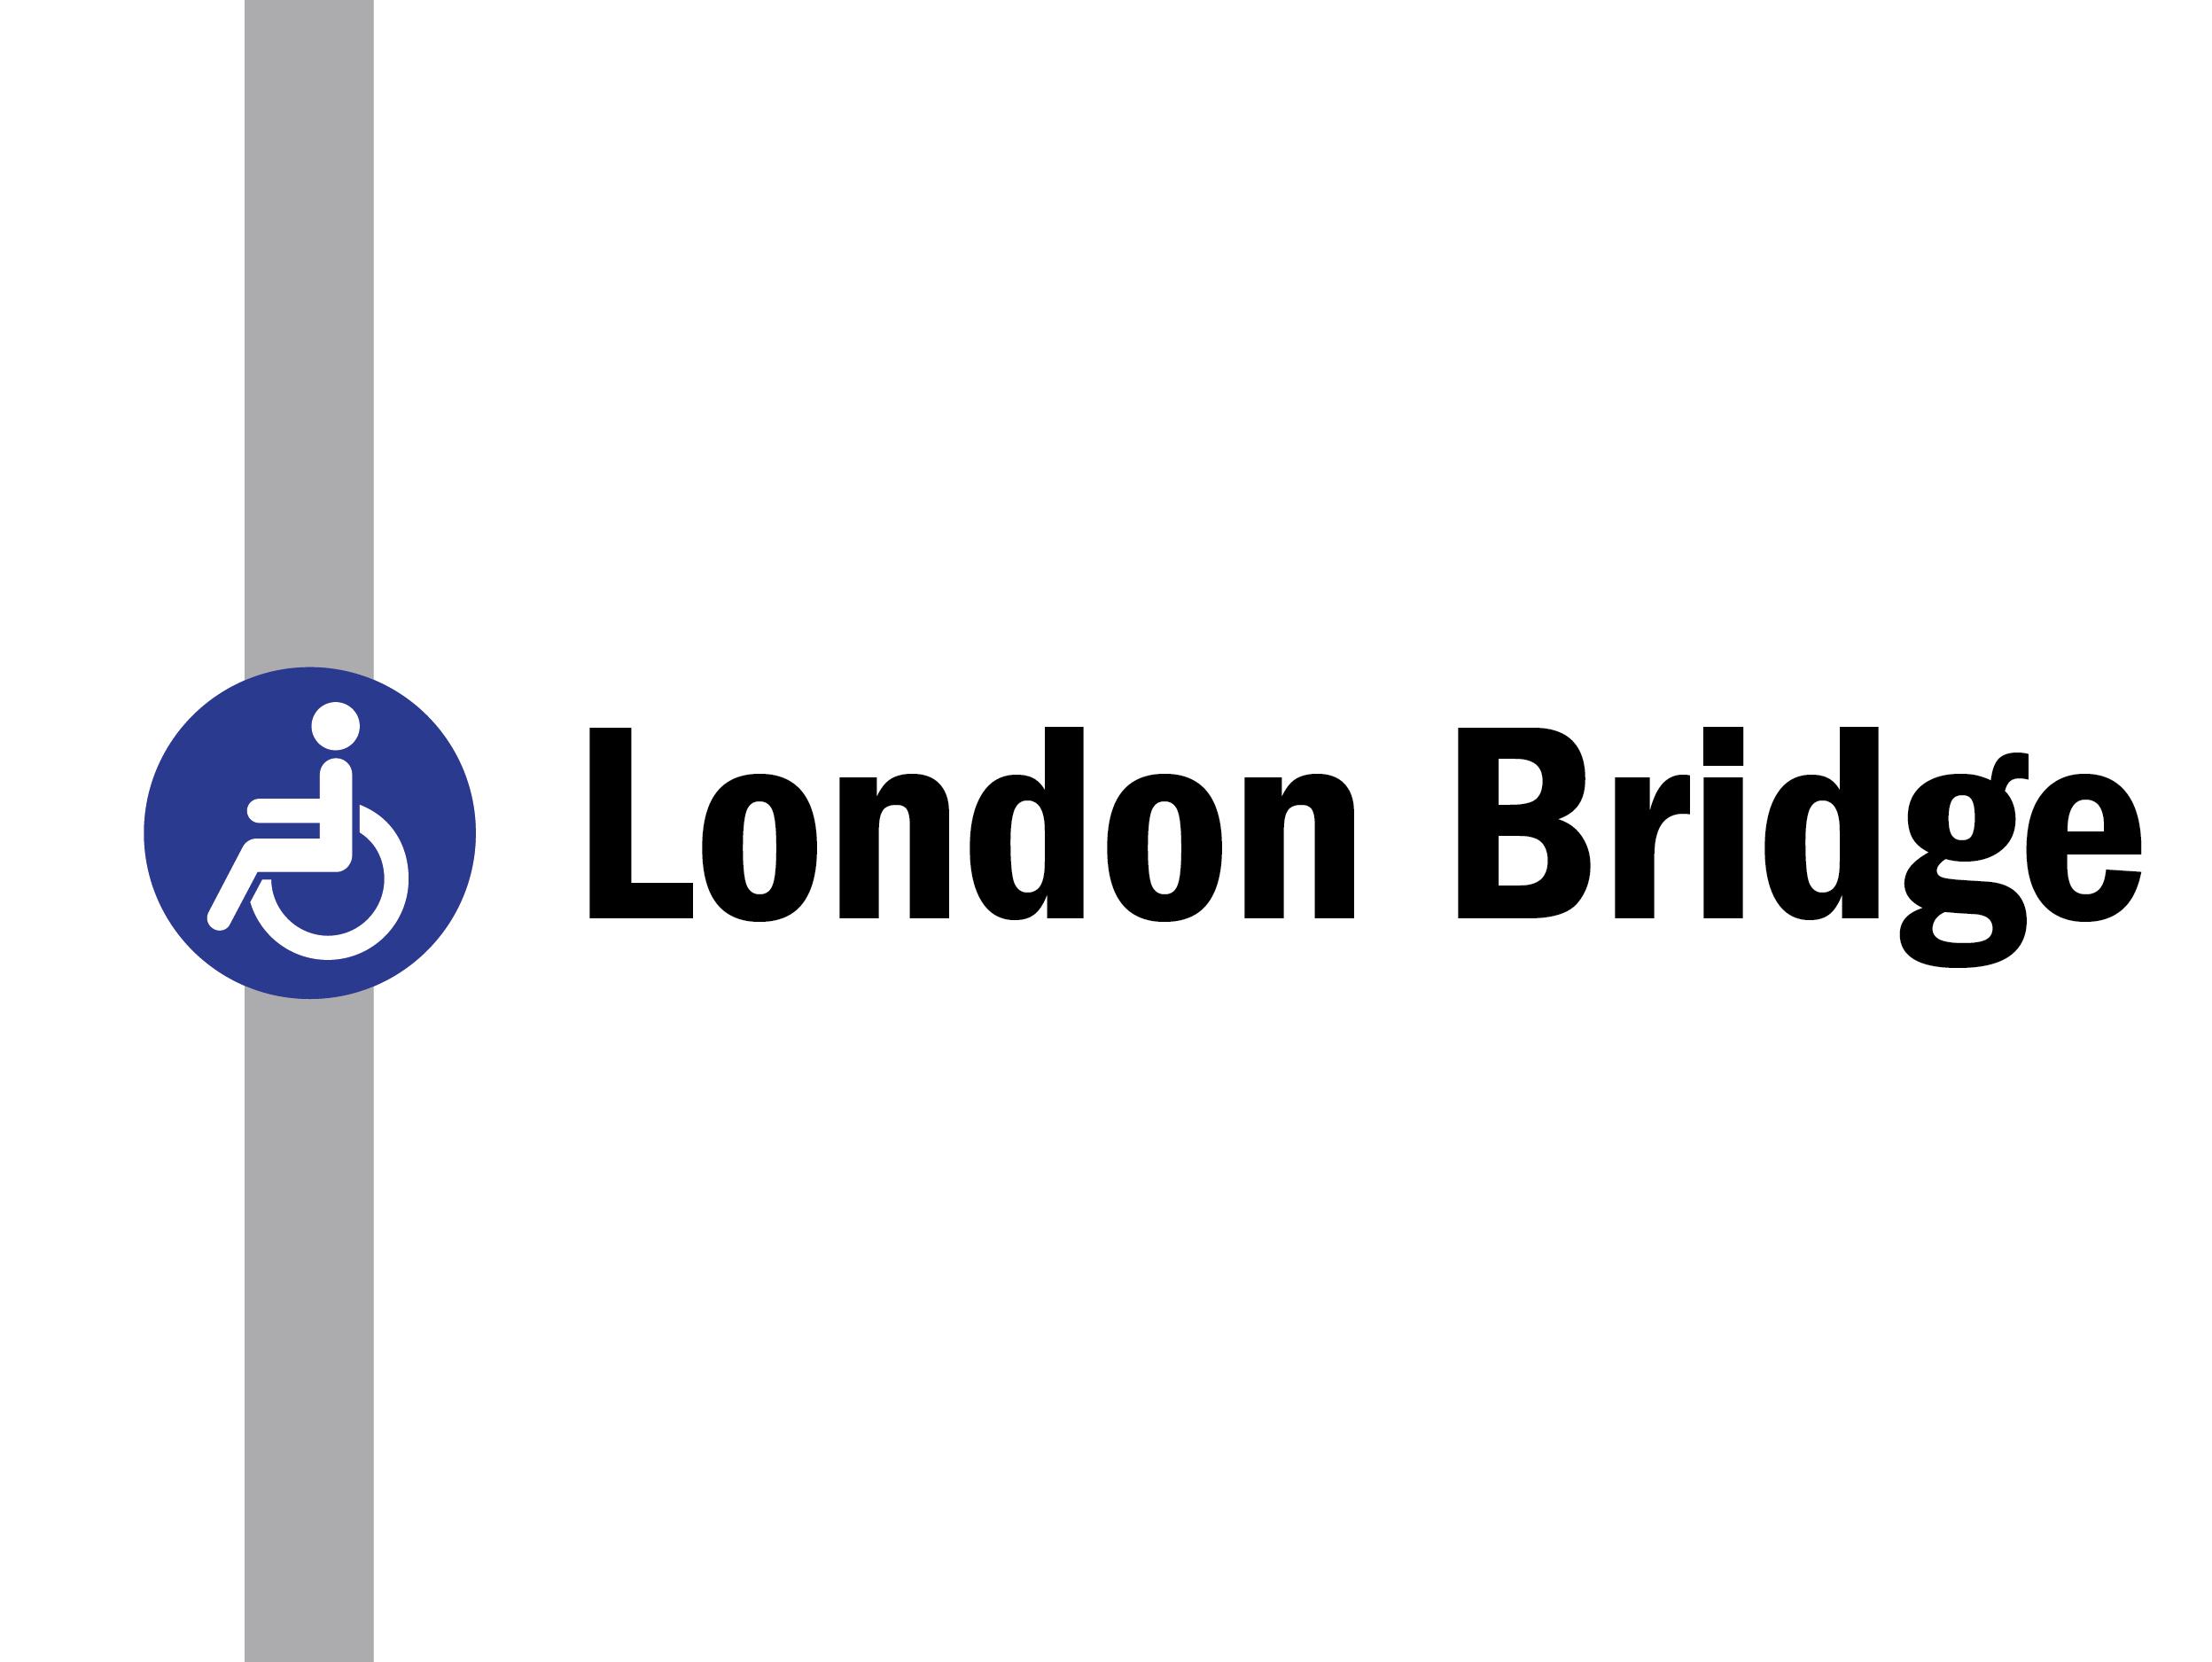 London Bridge, night tube